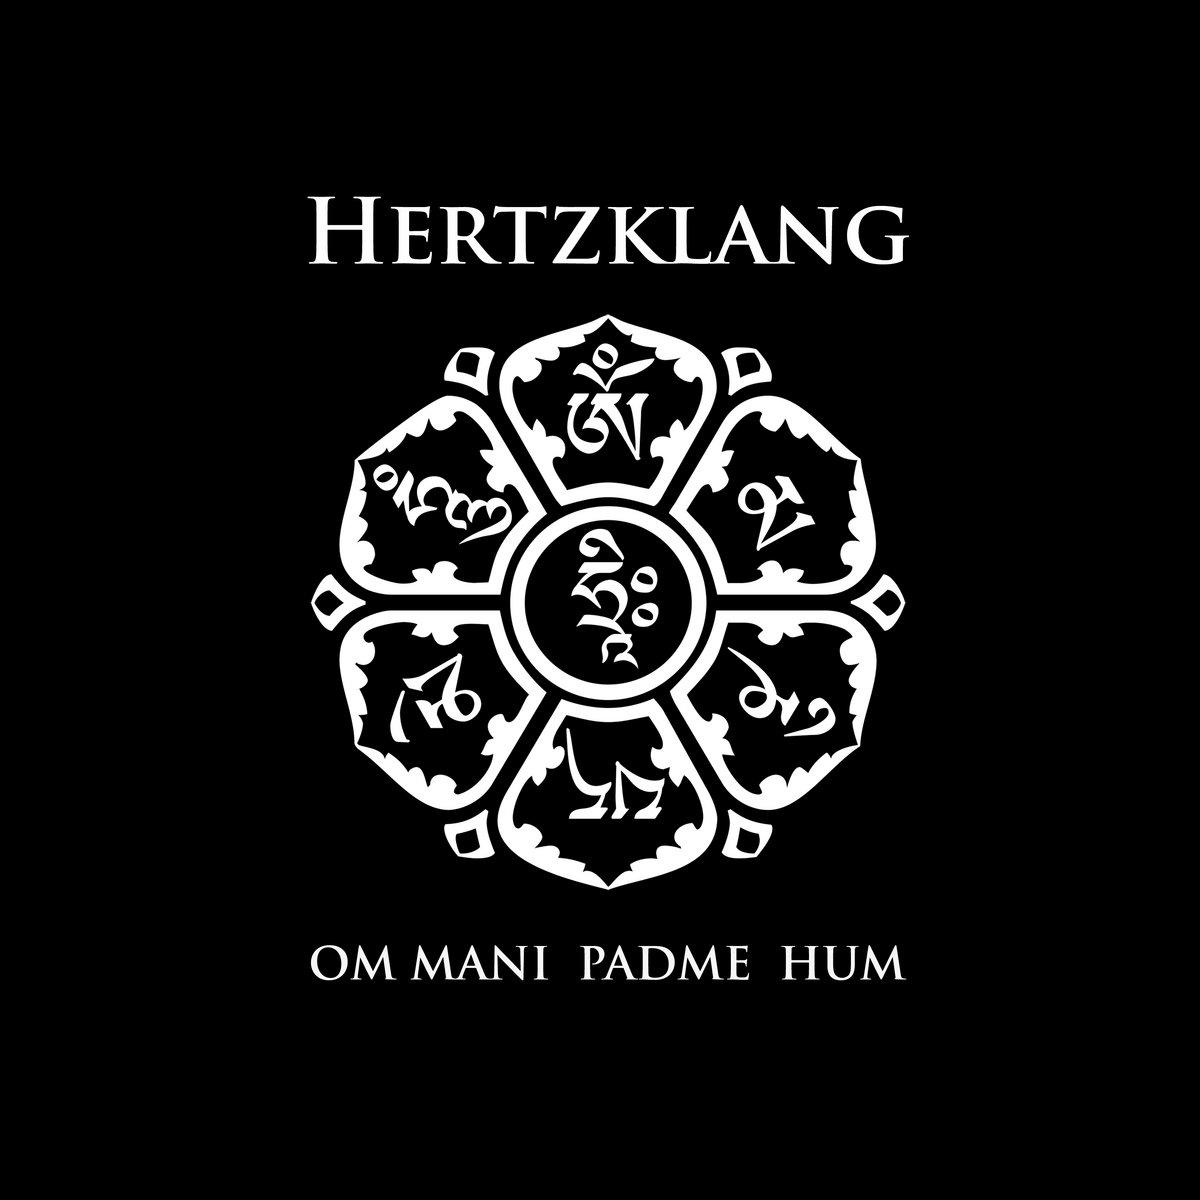 Om Mani Padme Hum Hertzklang